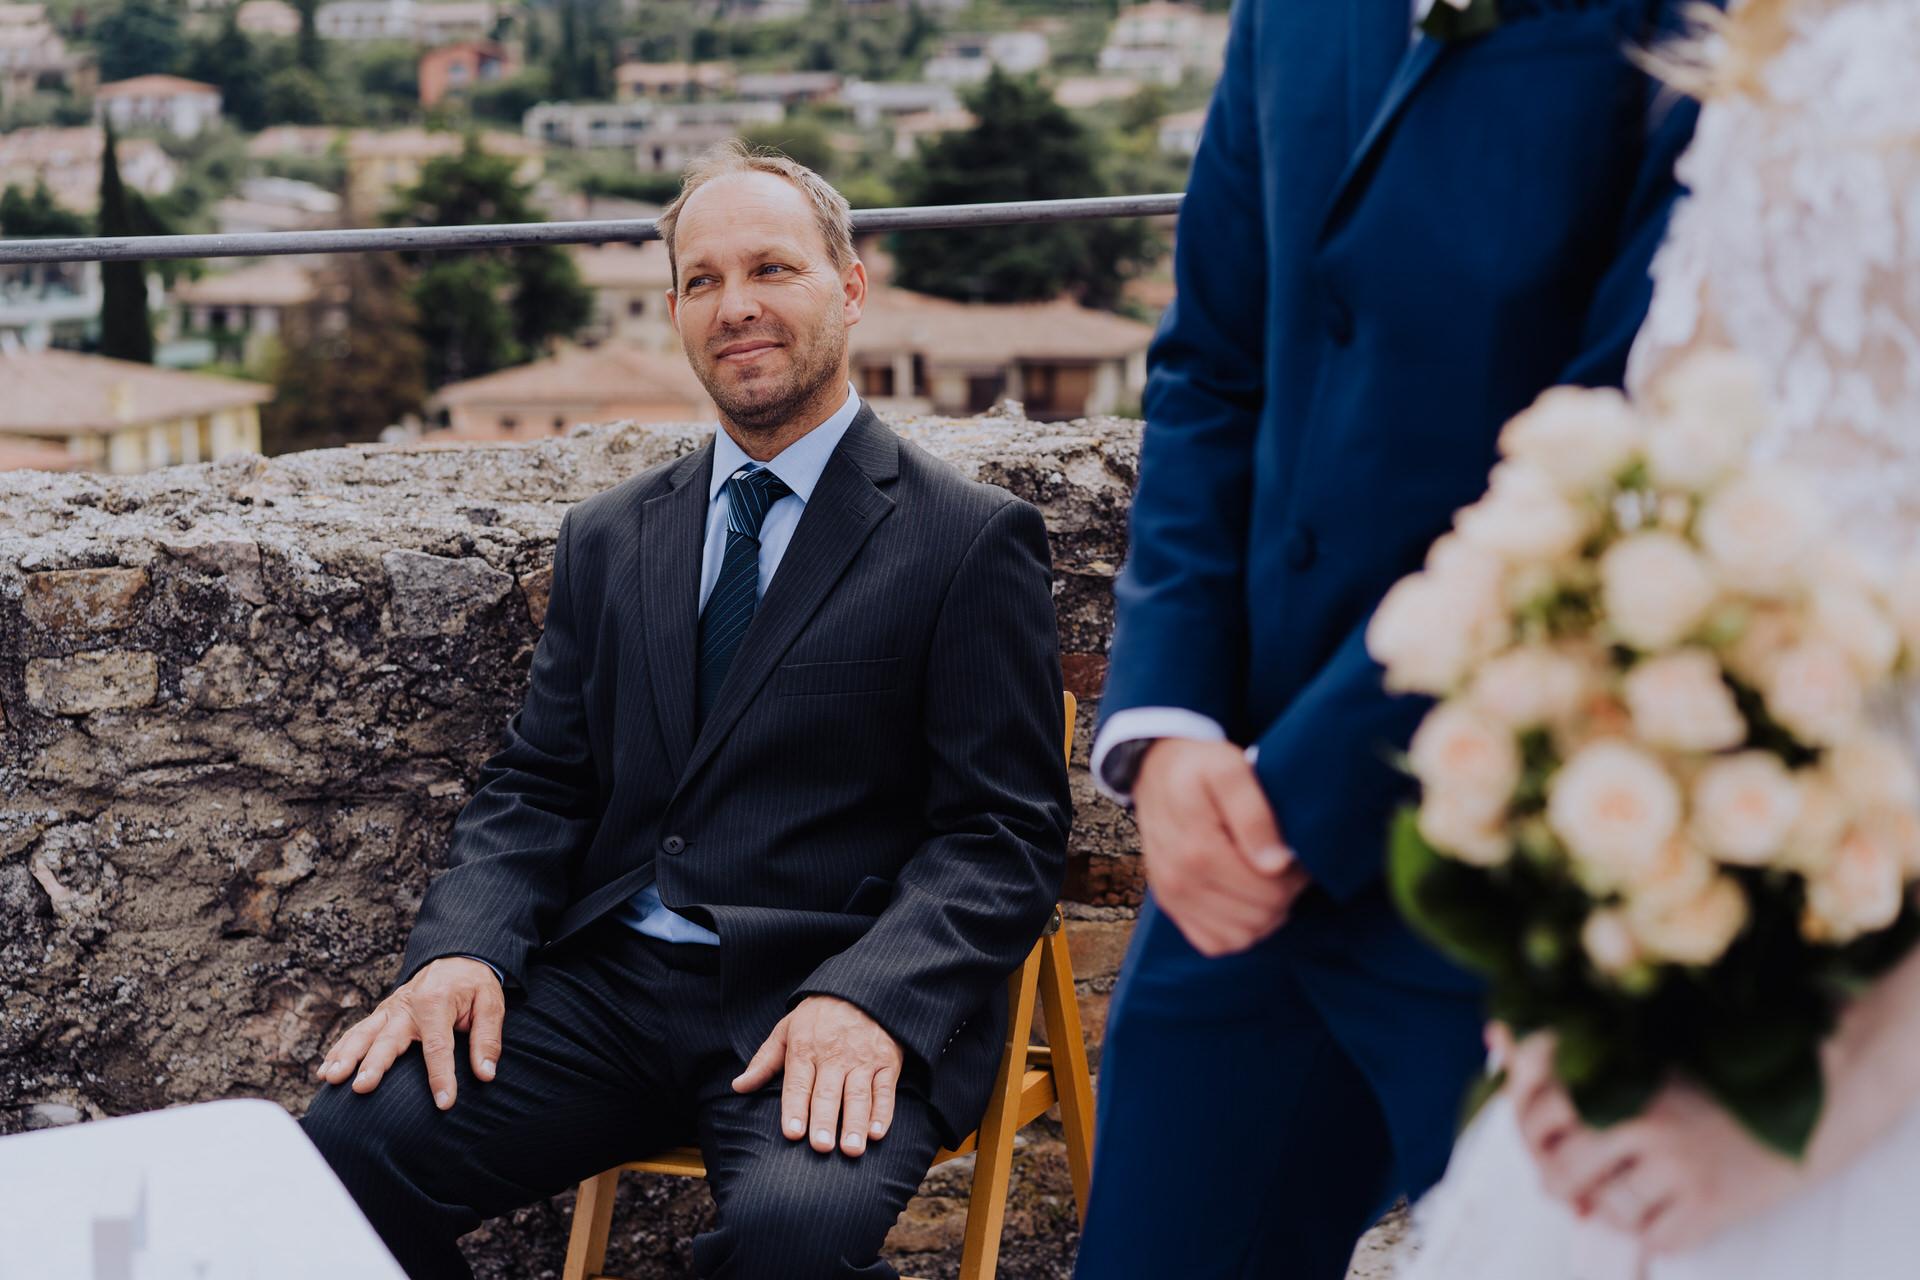 Lake Garda Weddings - Italian Photographers   A witness at the wedding smiles as he soaks up the magnitude